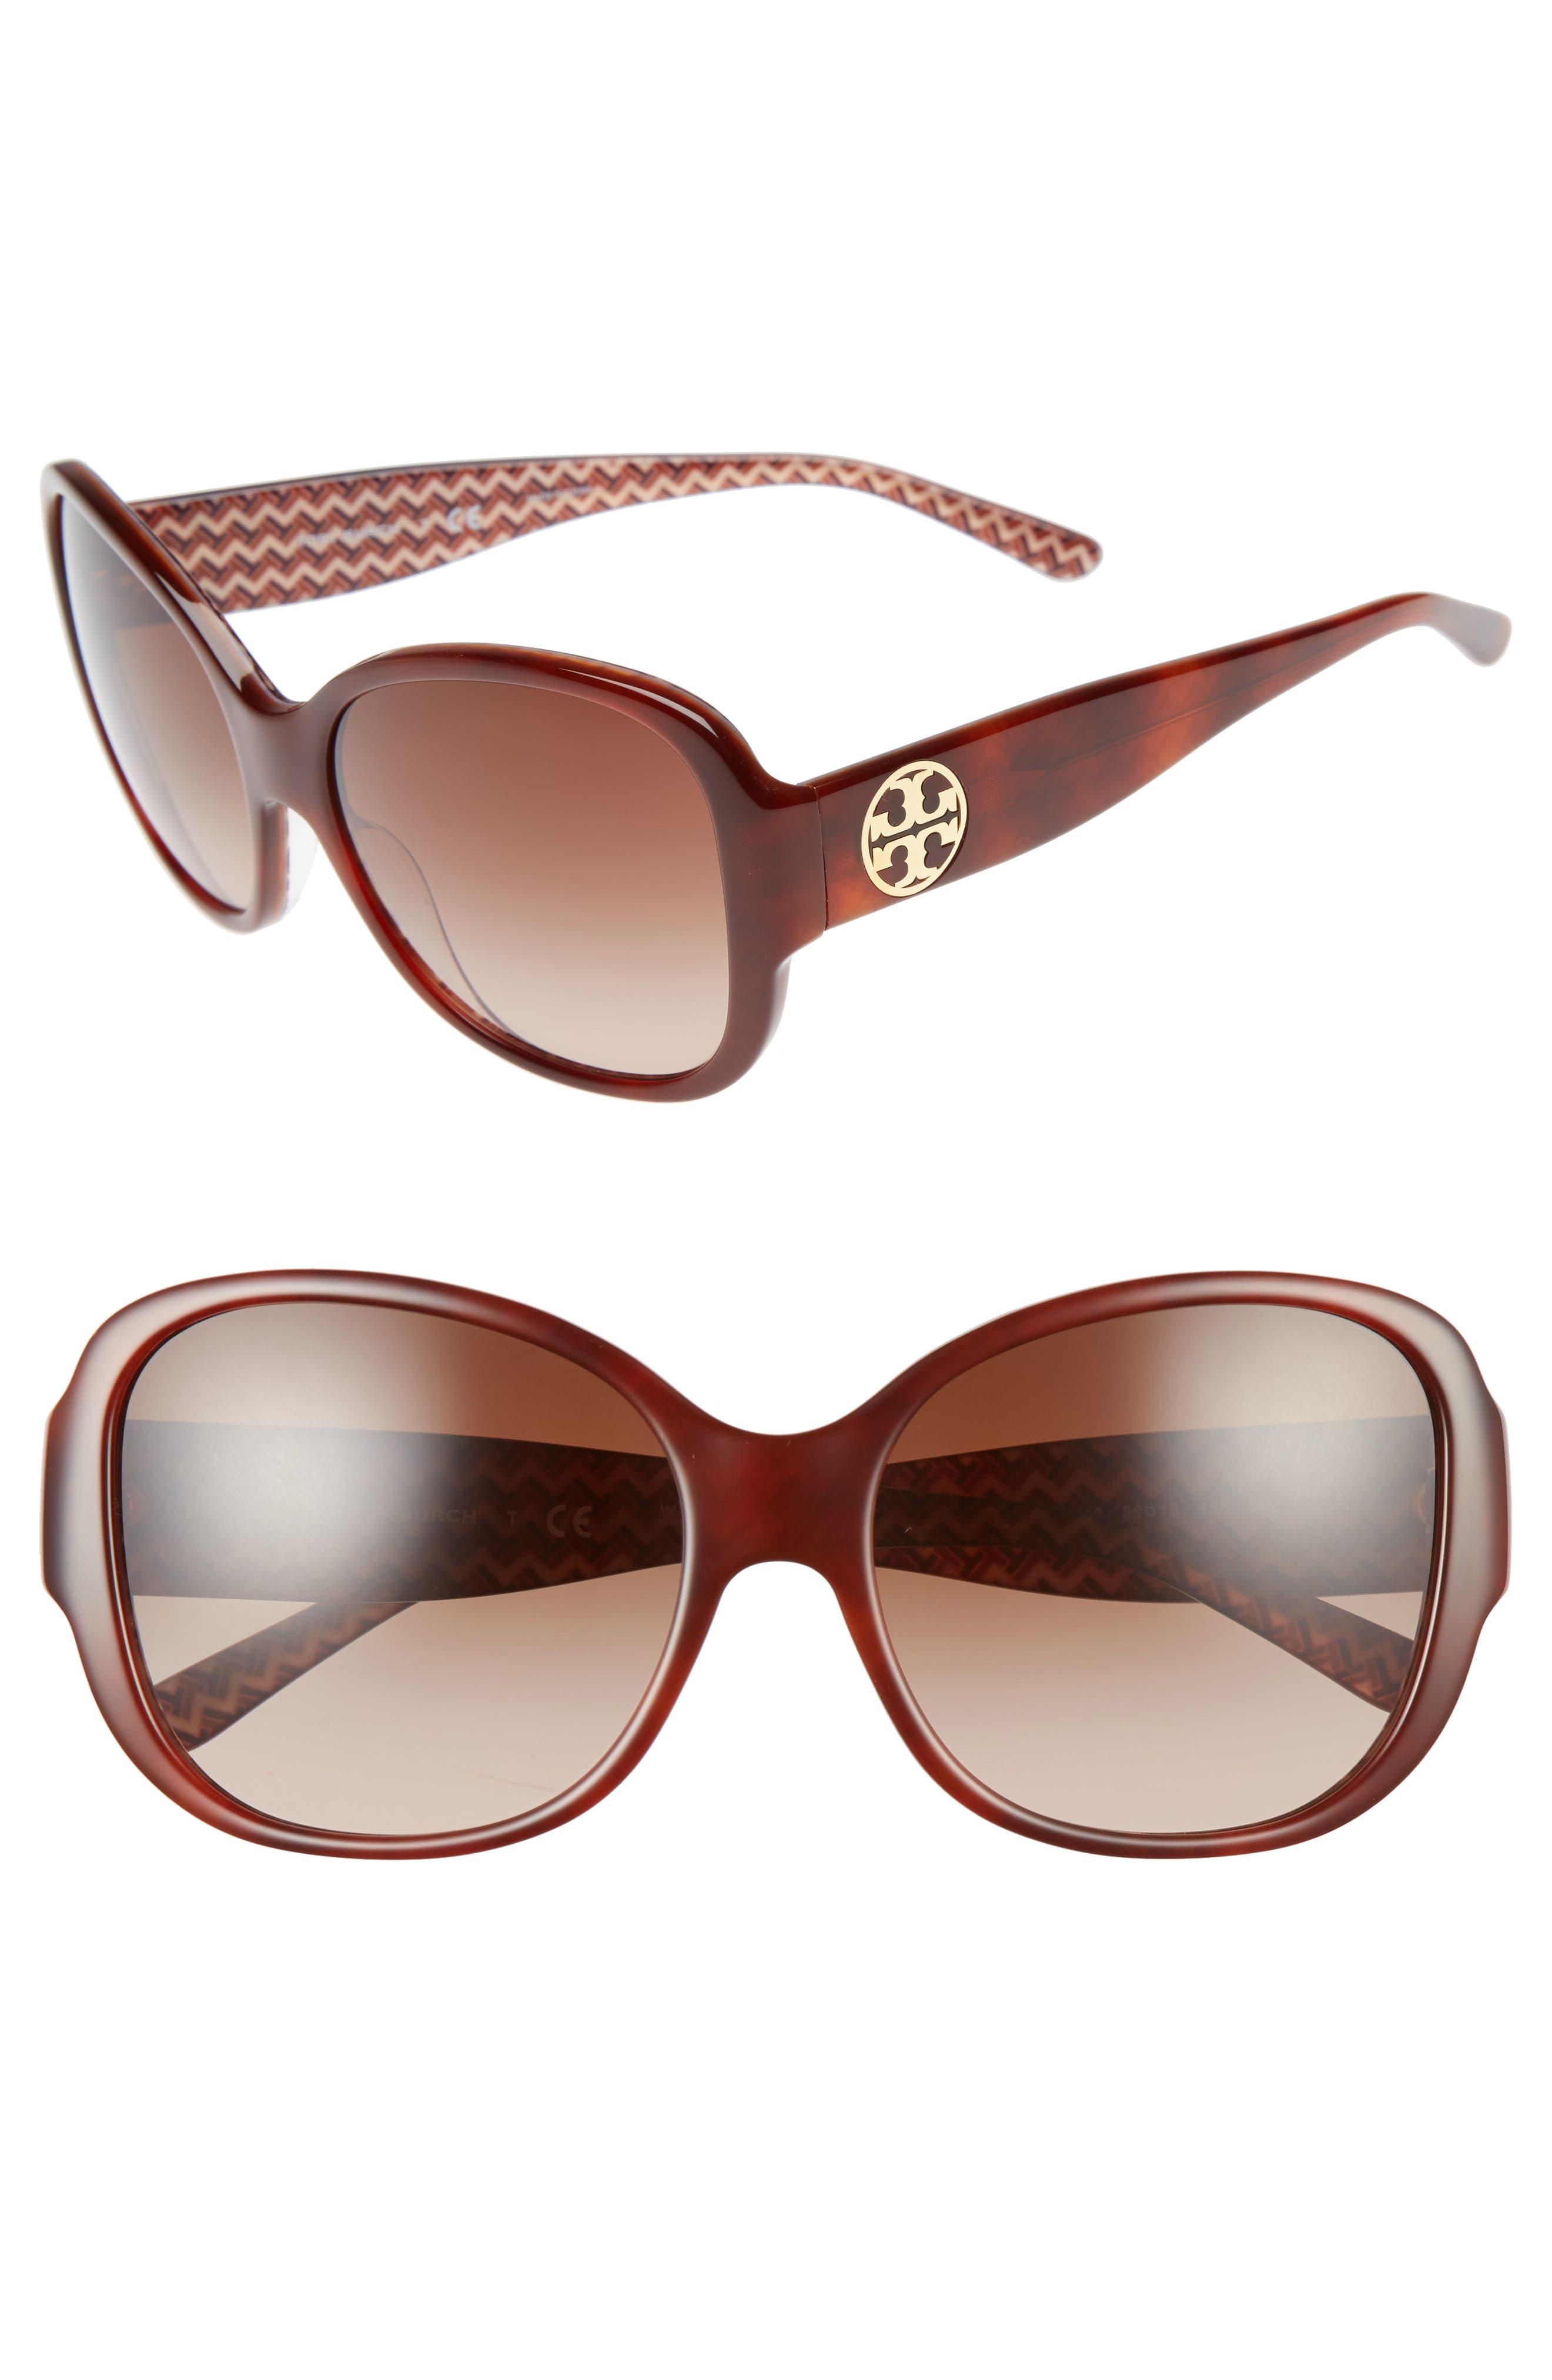 Tory Burch 56mm Gradient Retro Sunglasses